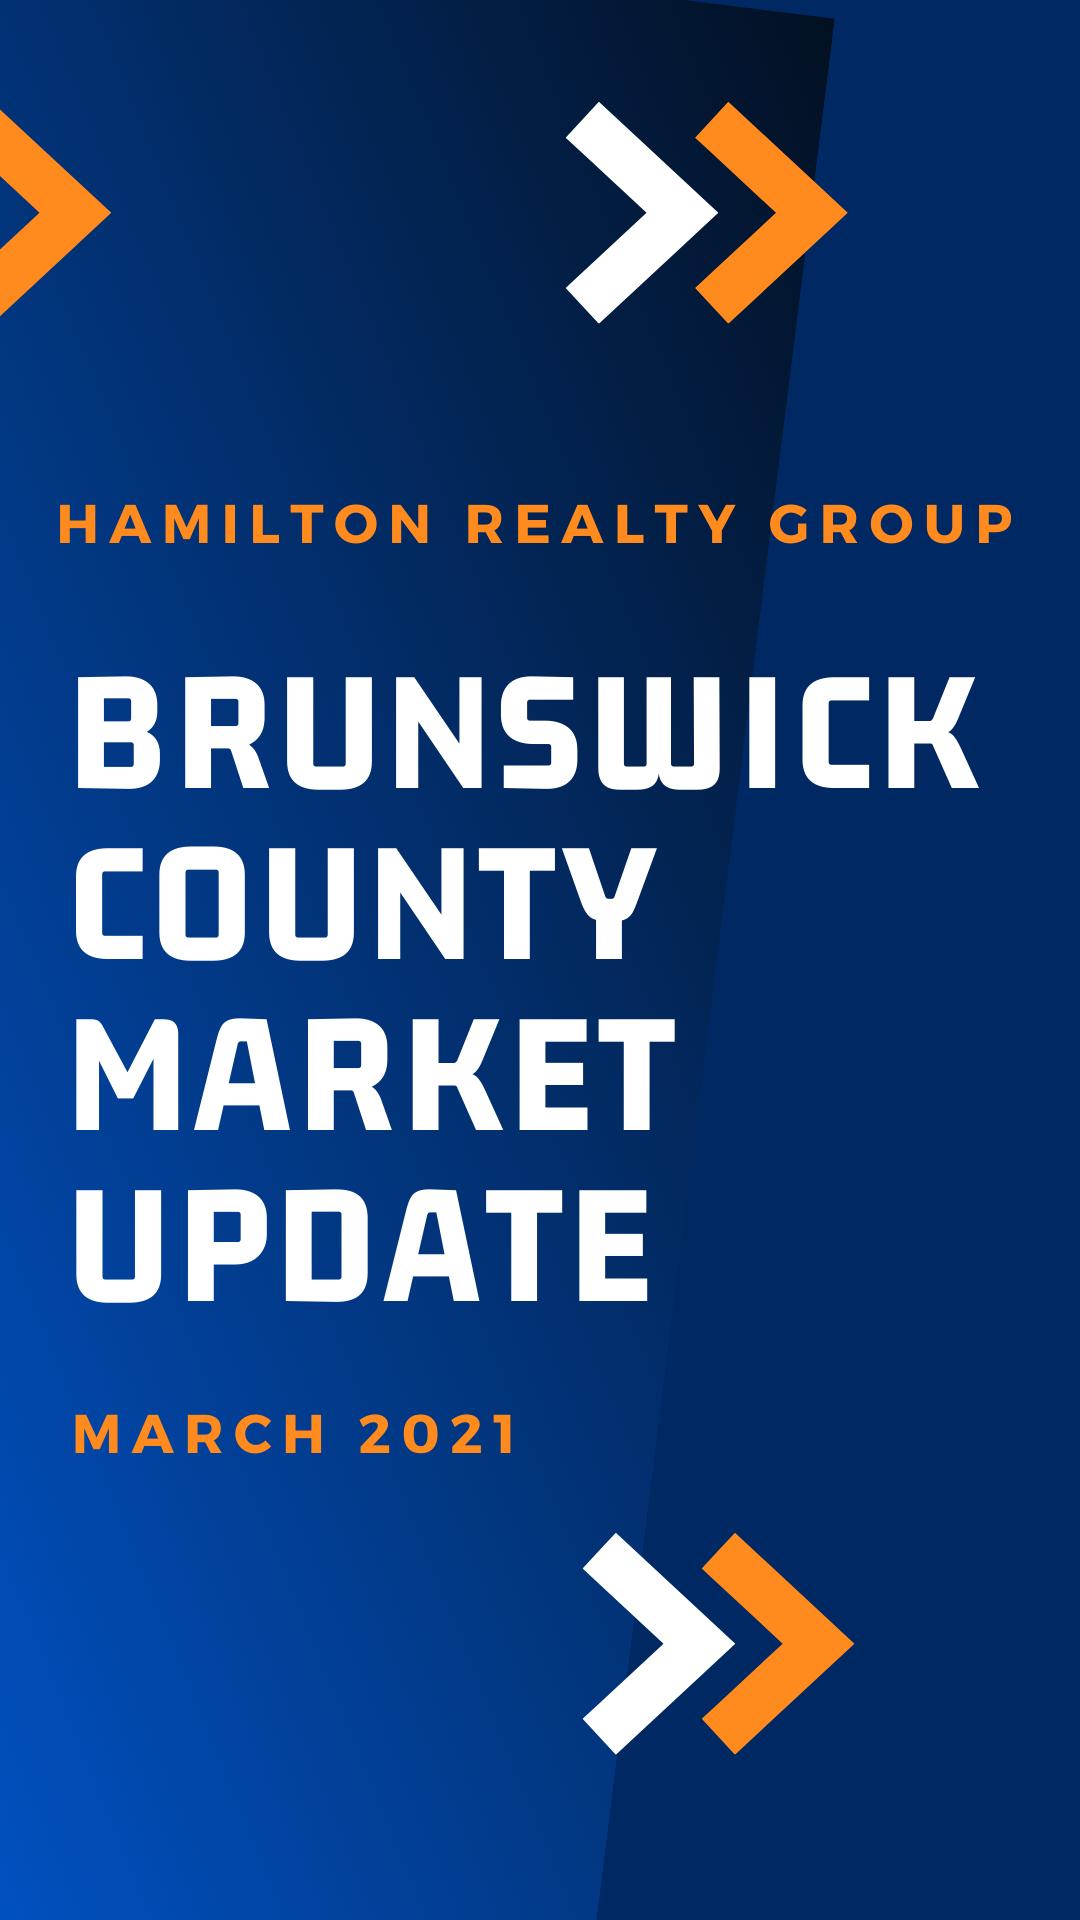 MARCH 2021: Brunswick County Market Update